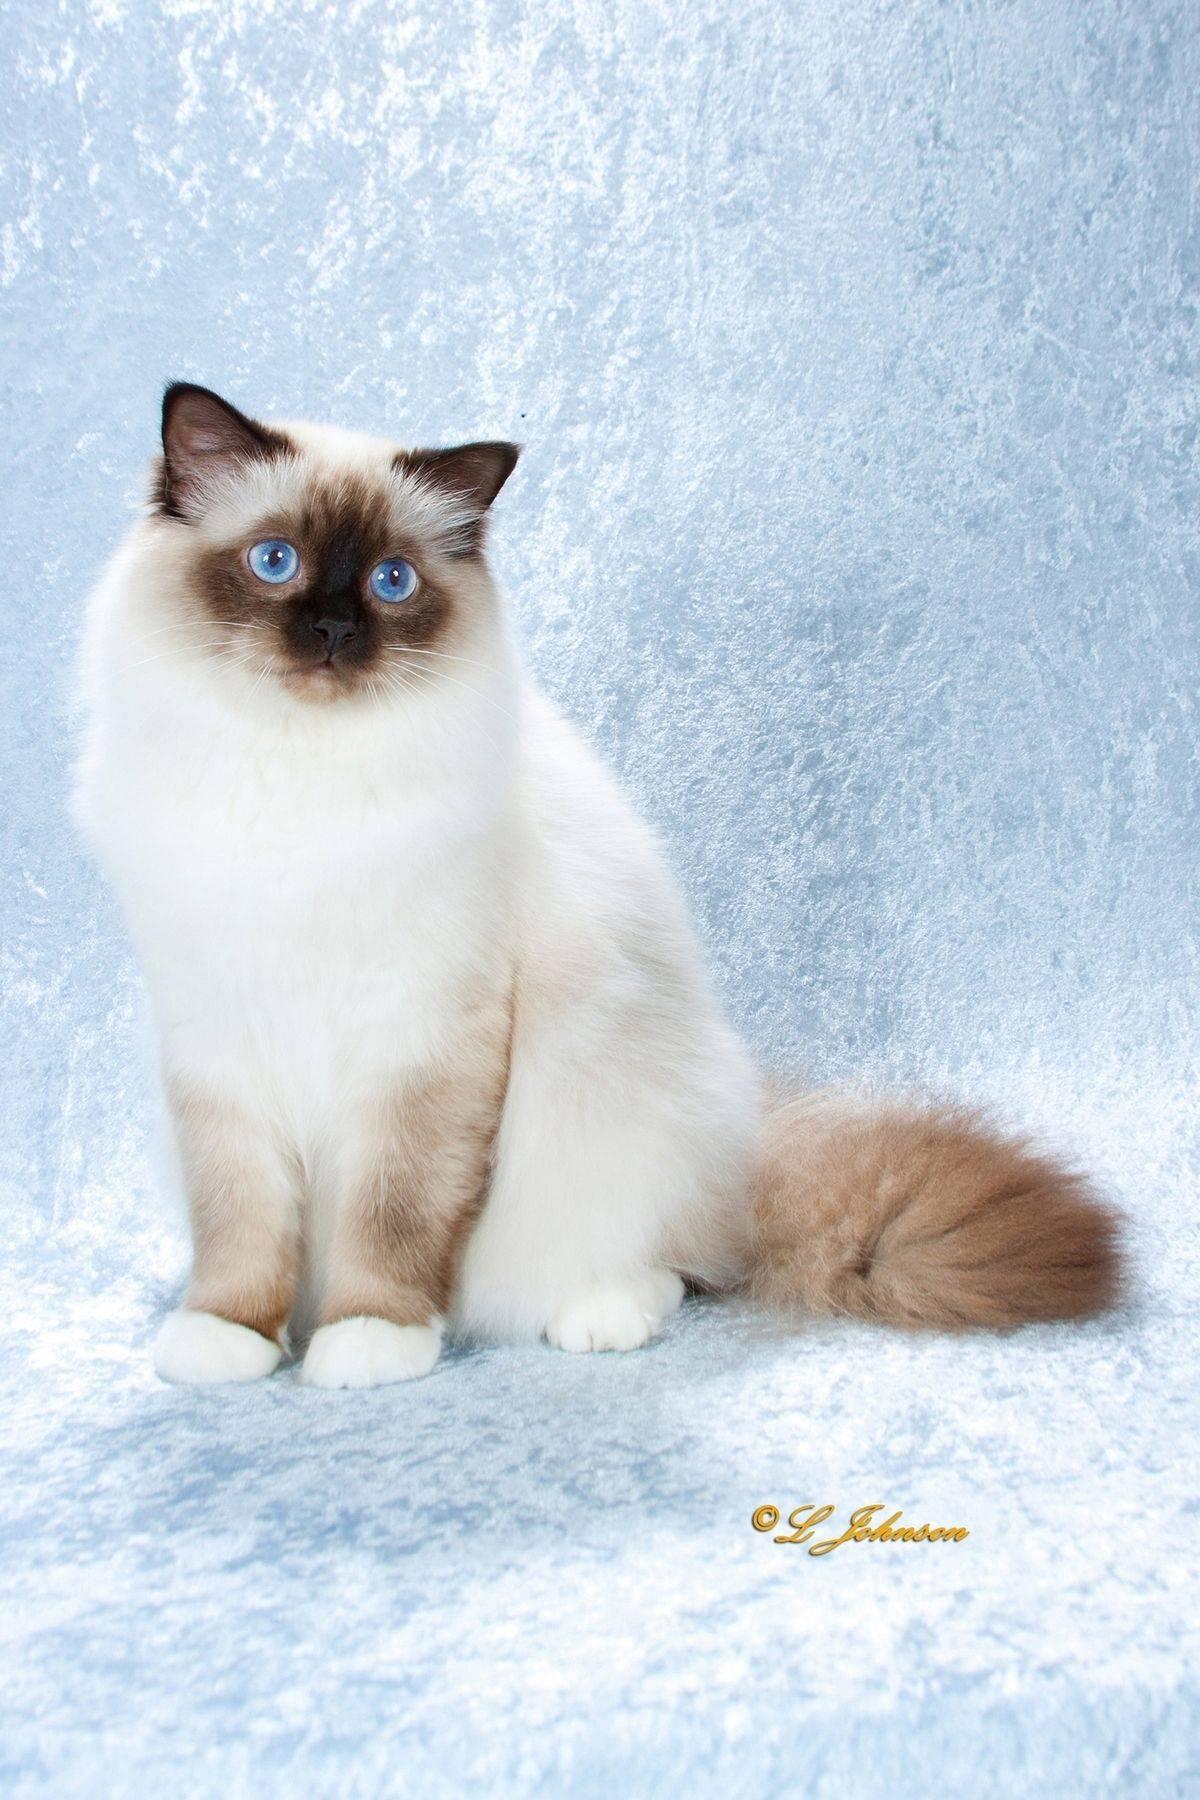 Кошка рэгдолл: описание породы, характер, фото, цена котенка